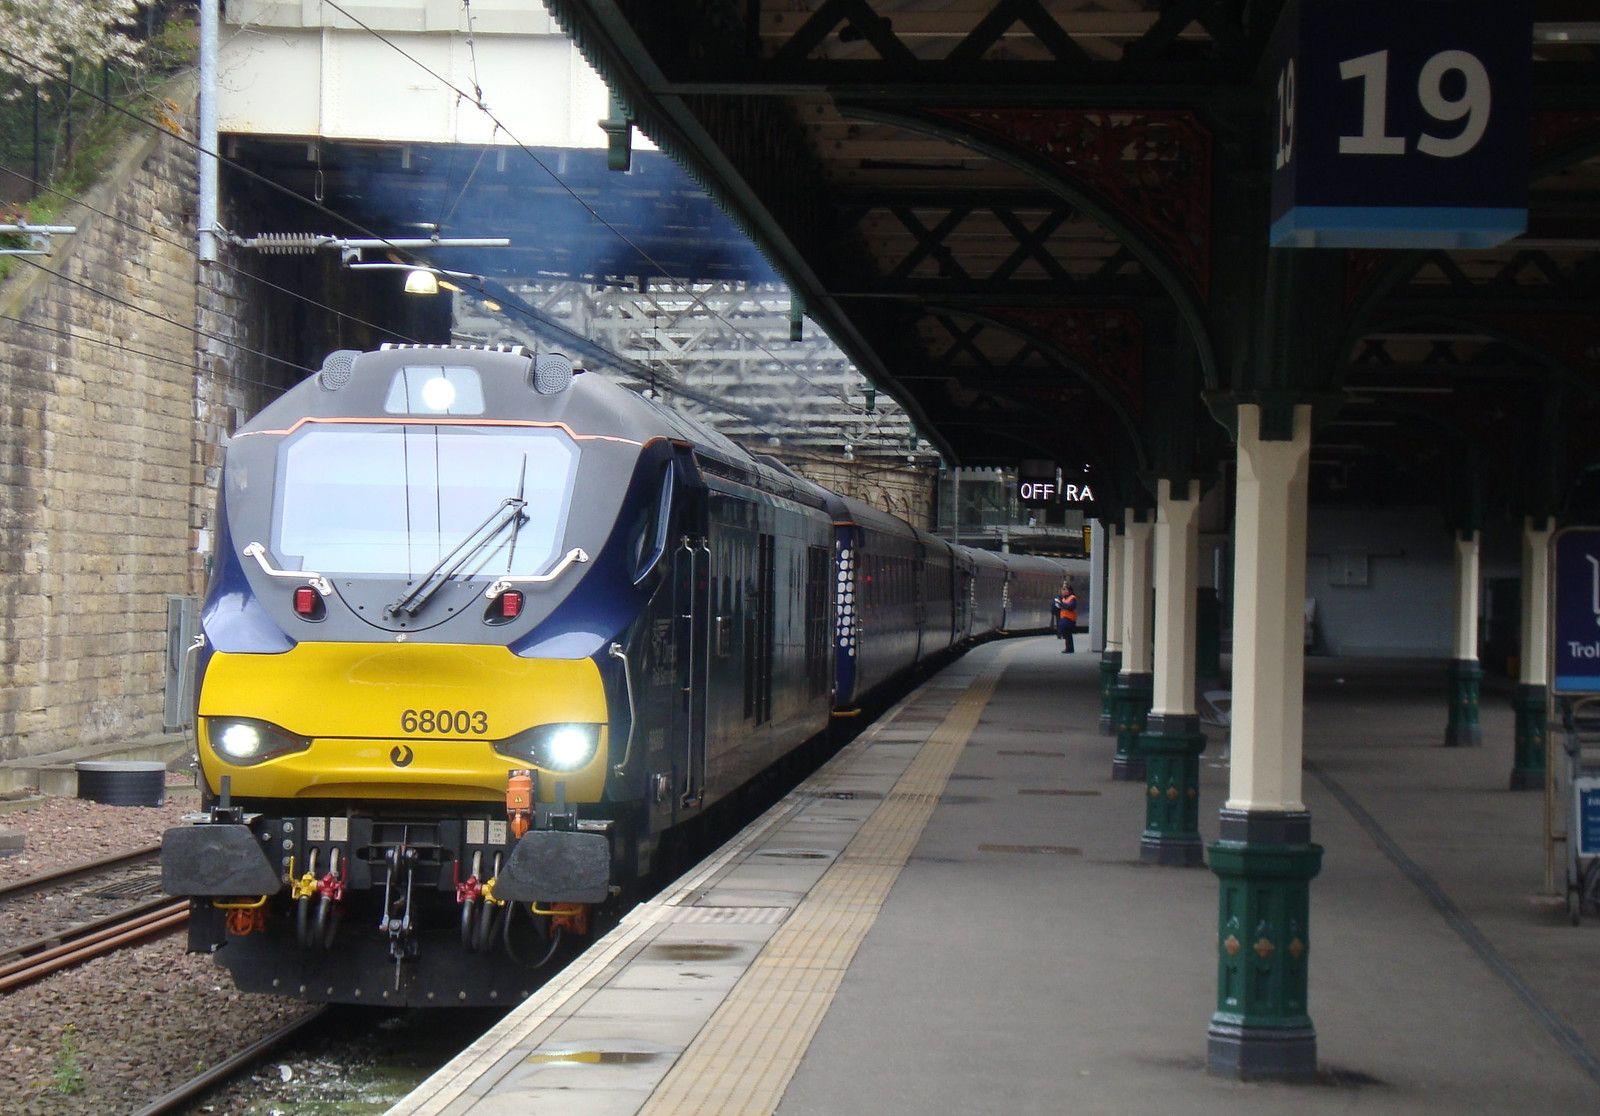 Direct Rail Services Class 68003 'Astute' departing Edinbu… | Flickr